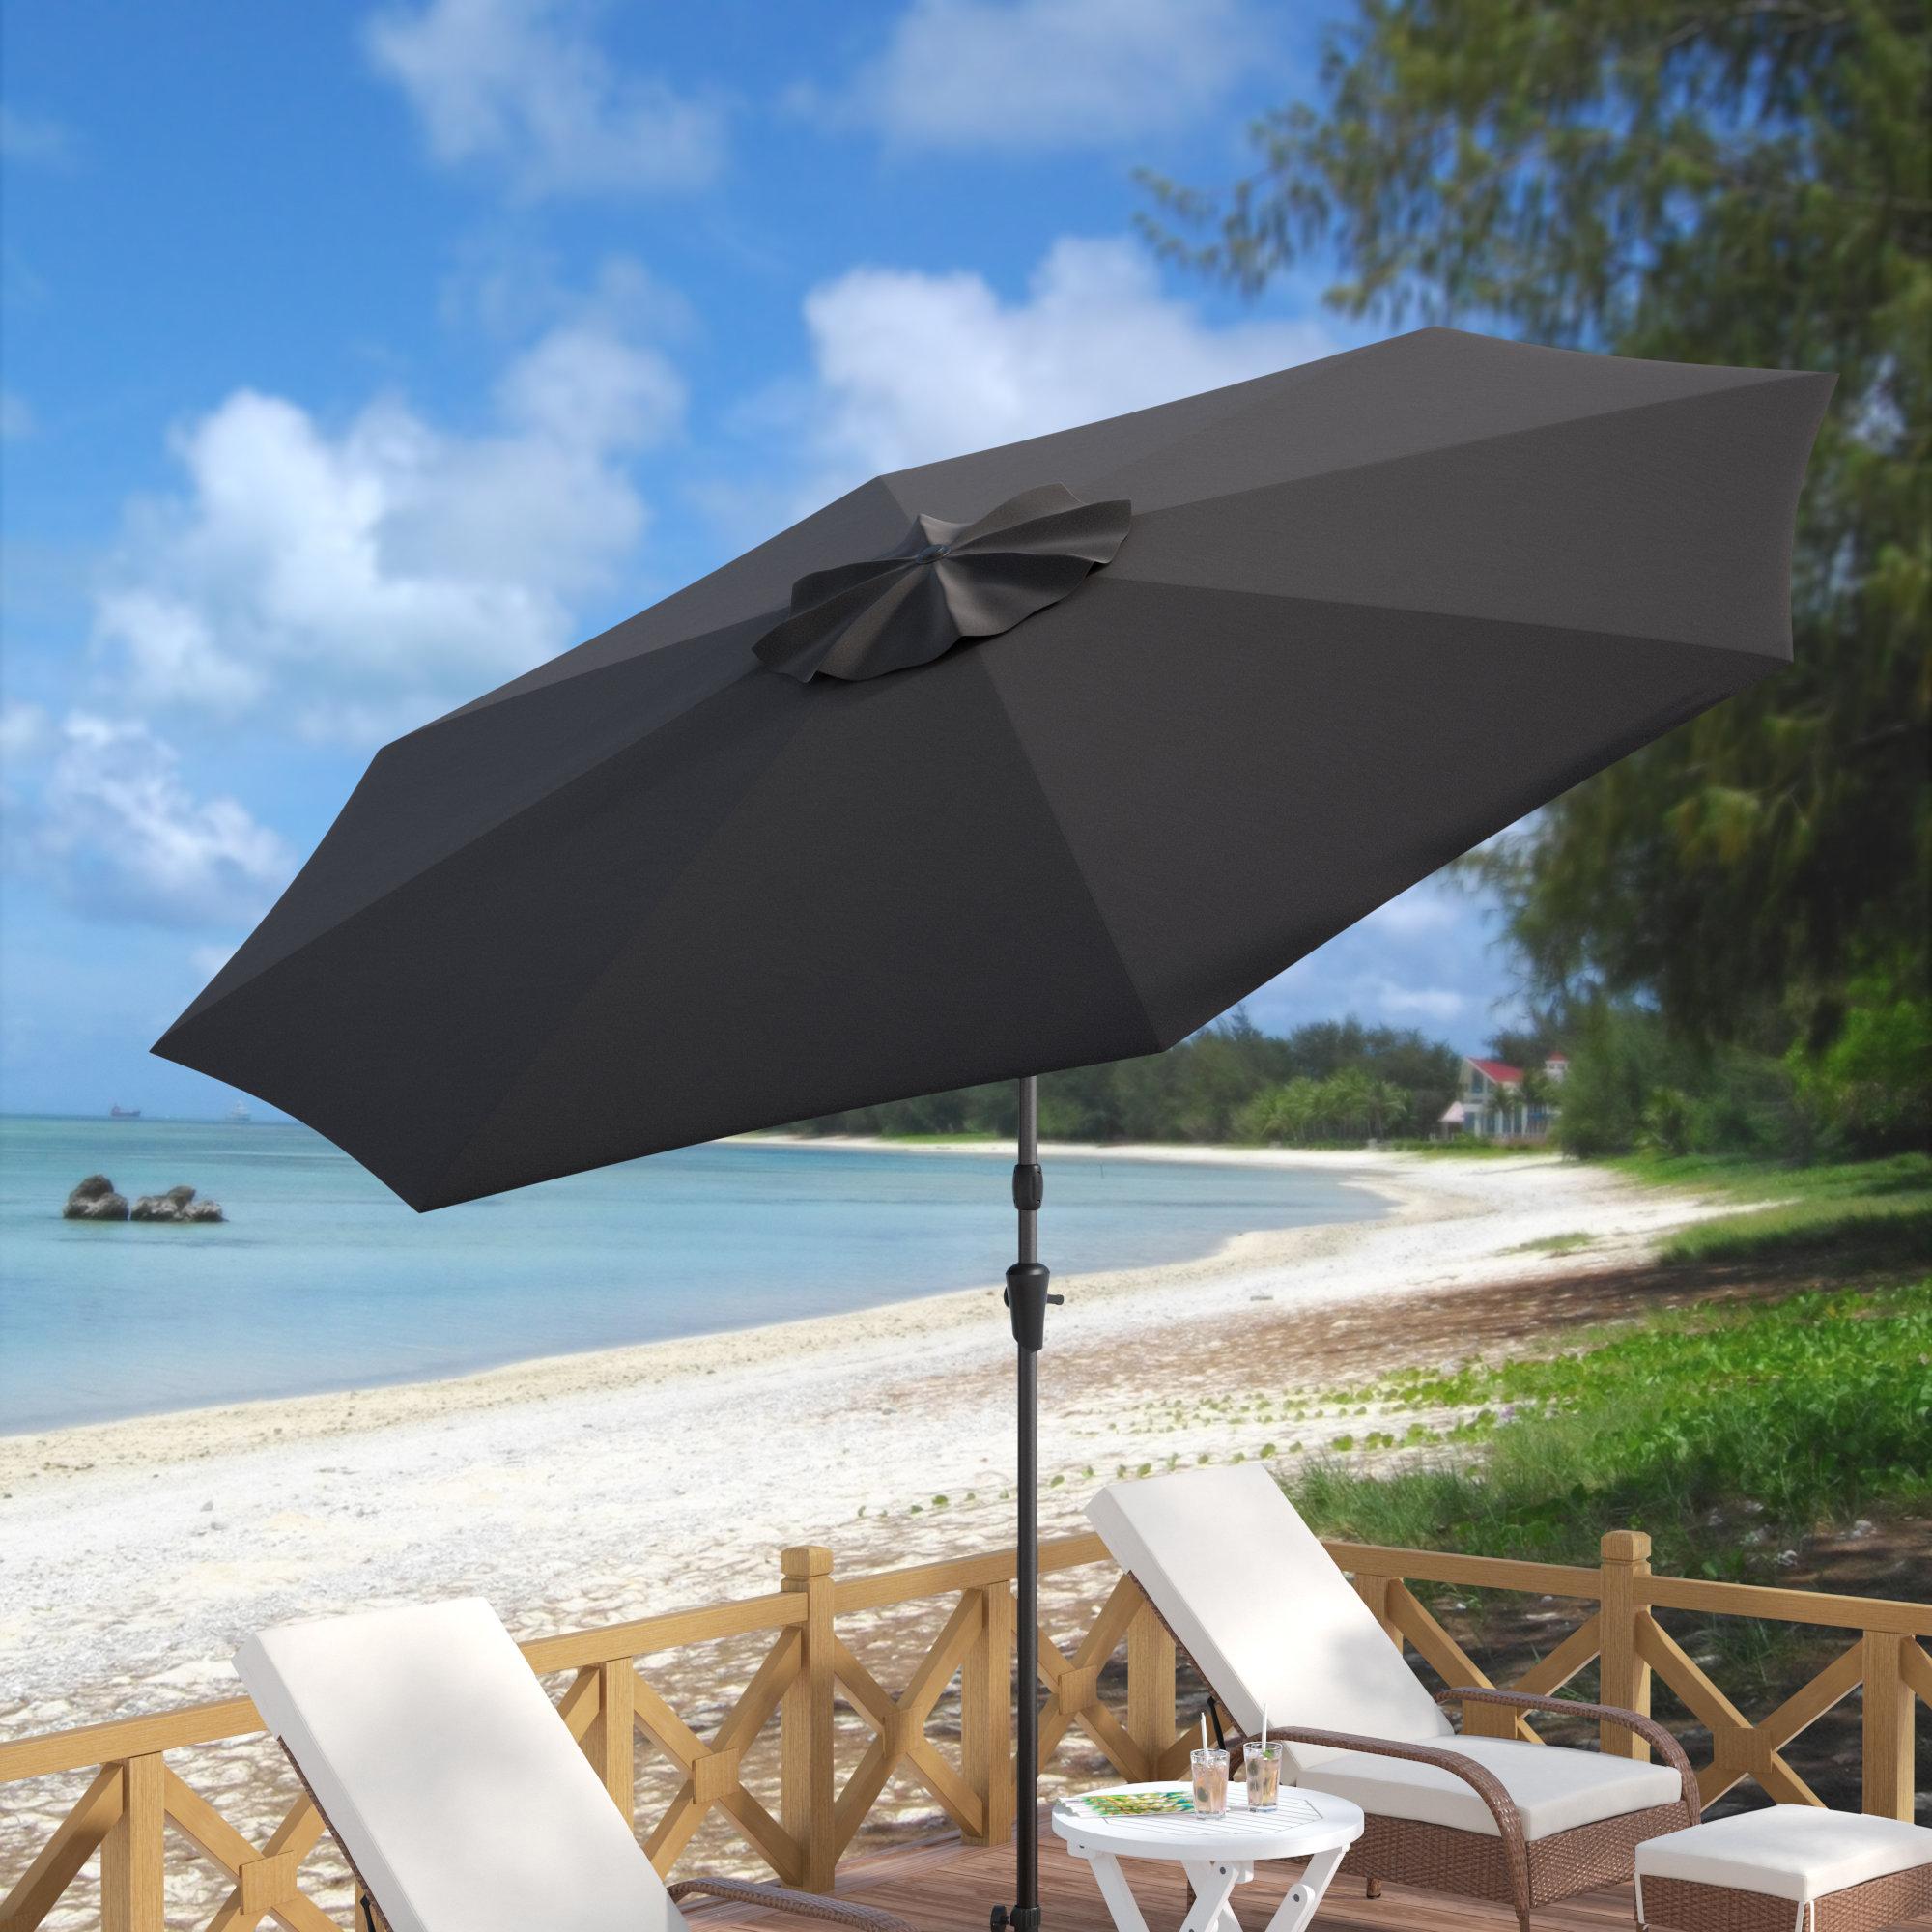 Preferred Featherste Market Umbrellas With Regard To Beachcrest Home Markley Market Beach Umbrella (View 17 of 20)